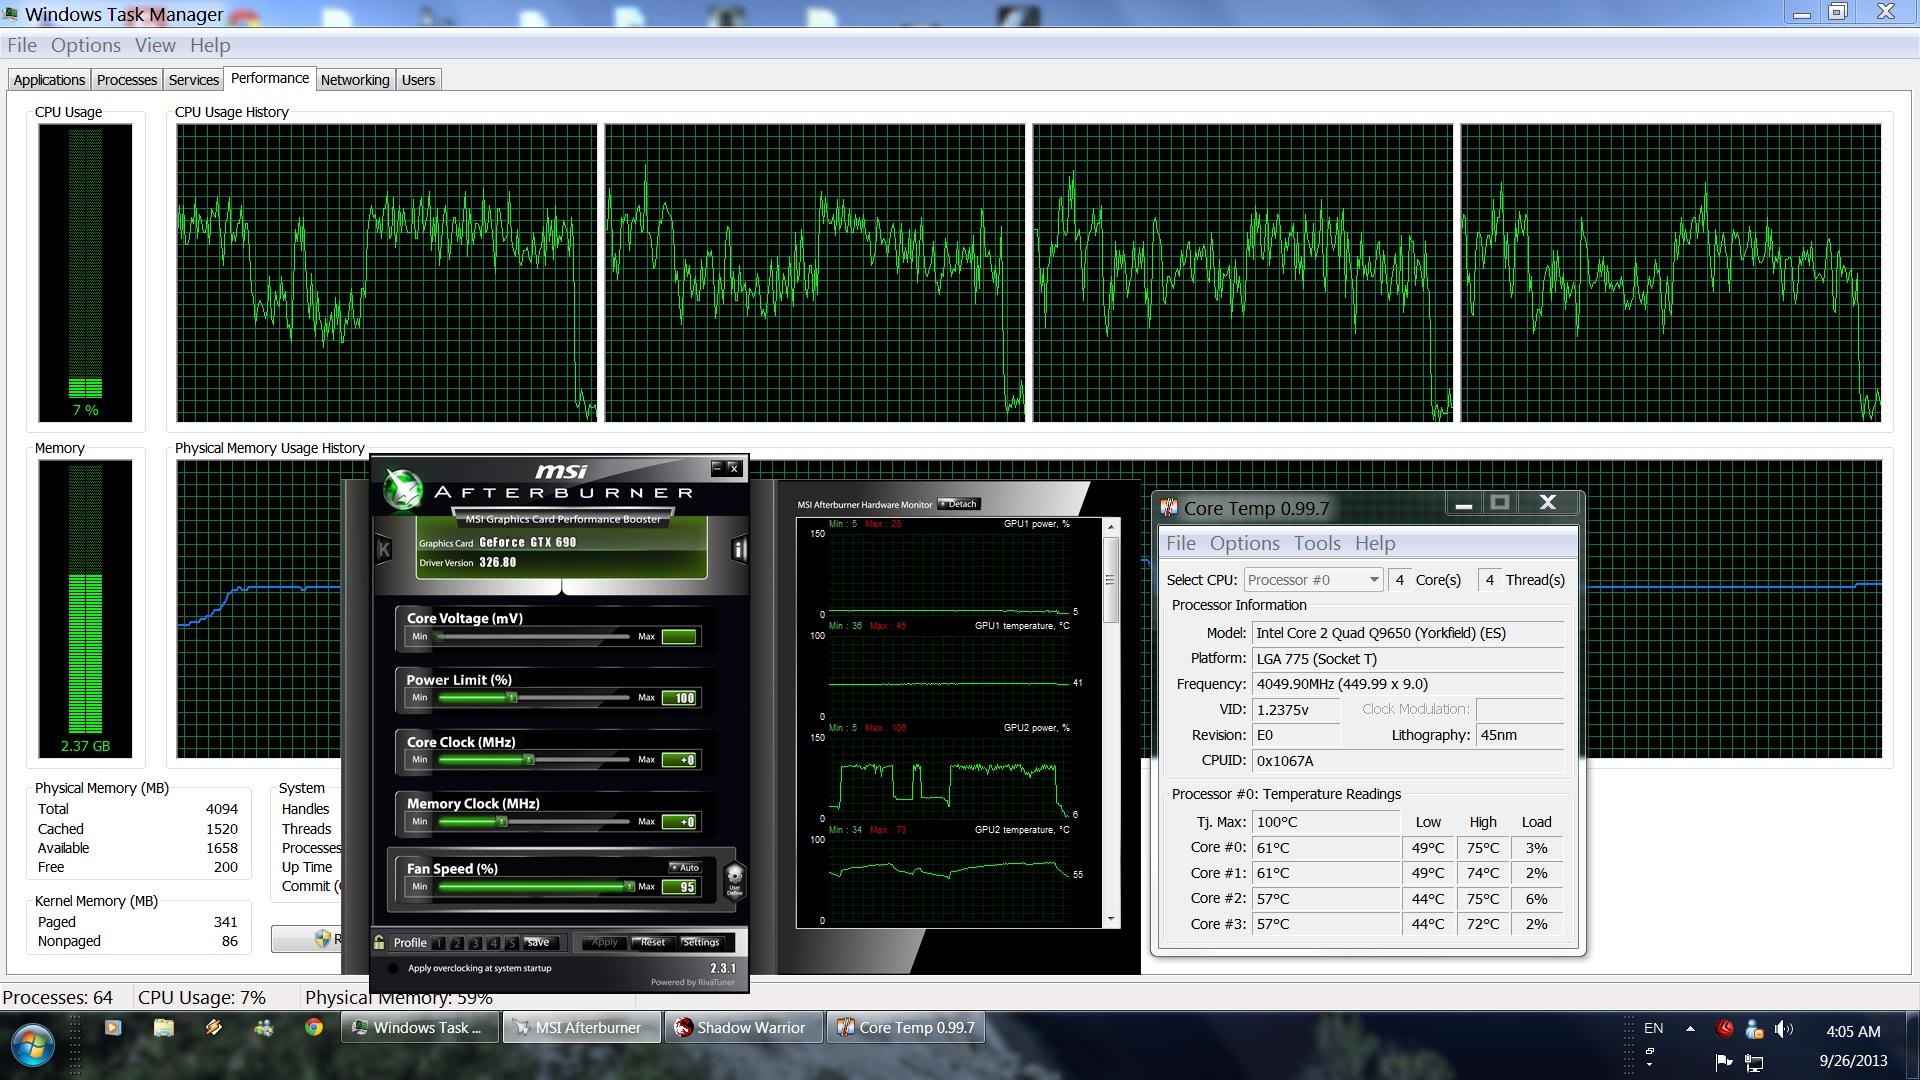 Shadow Warrior PC Performance